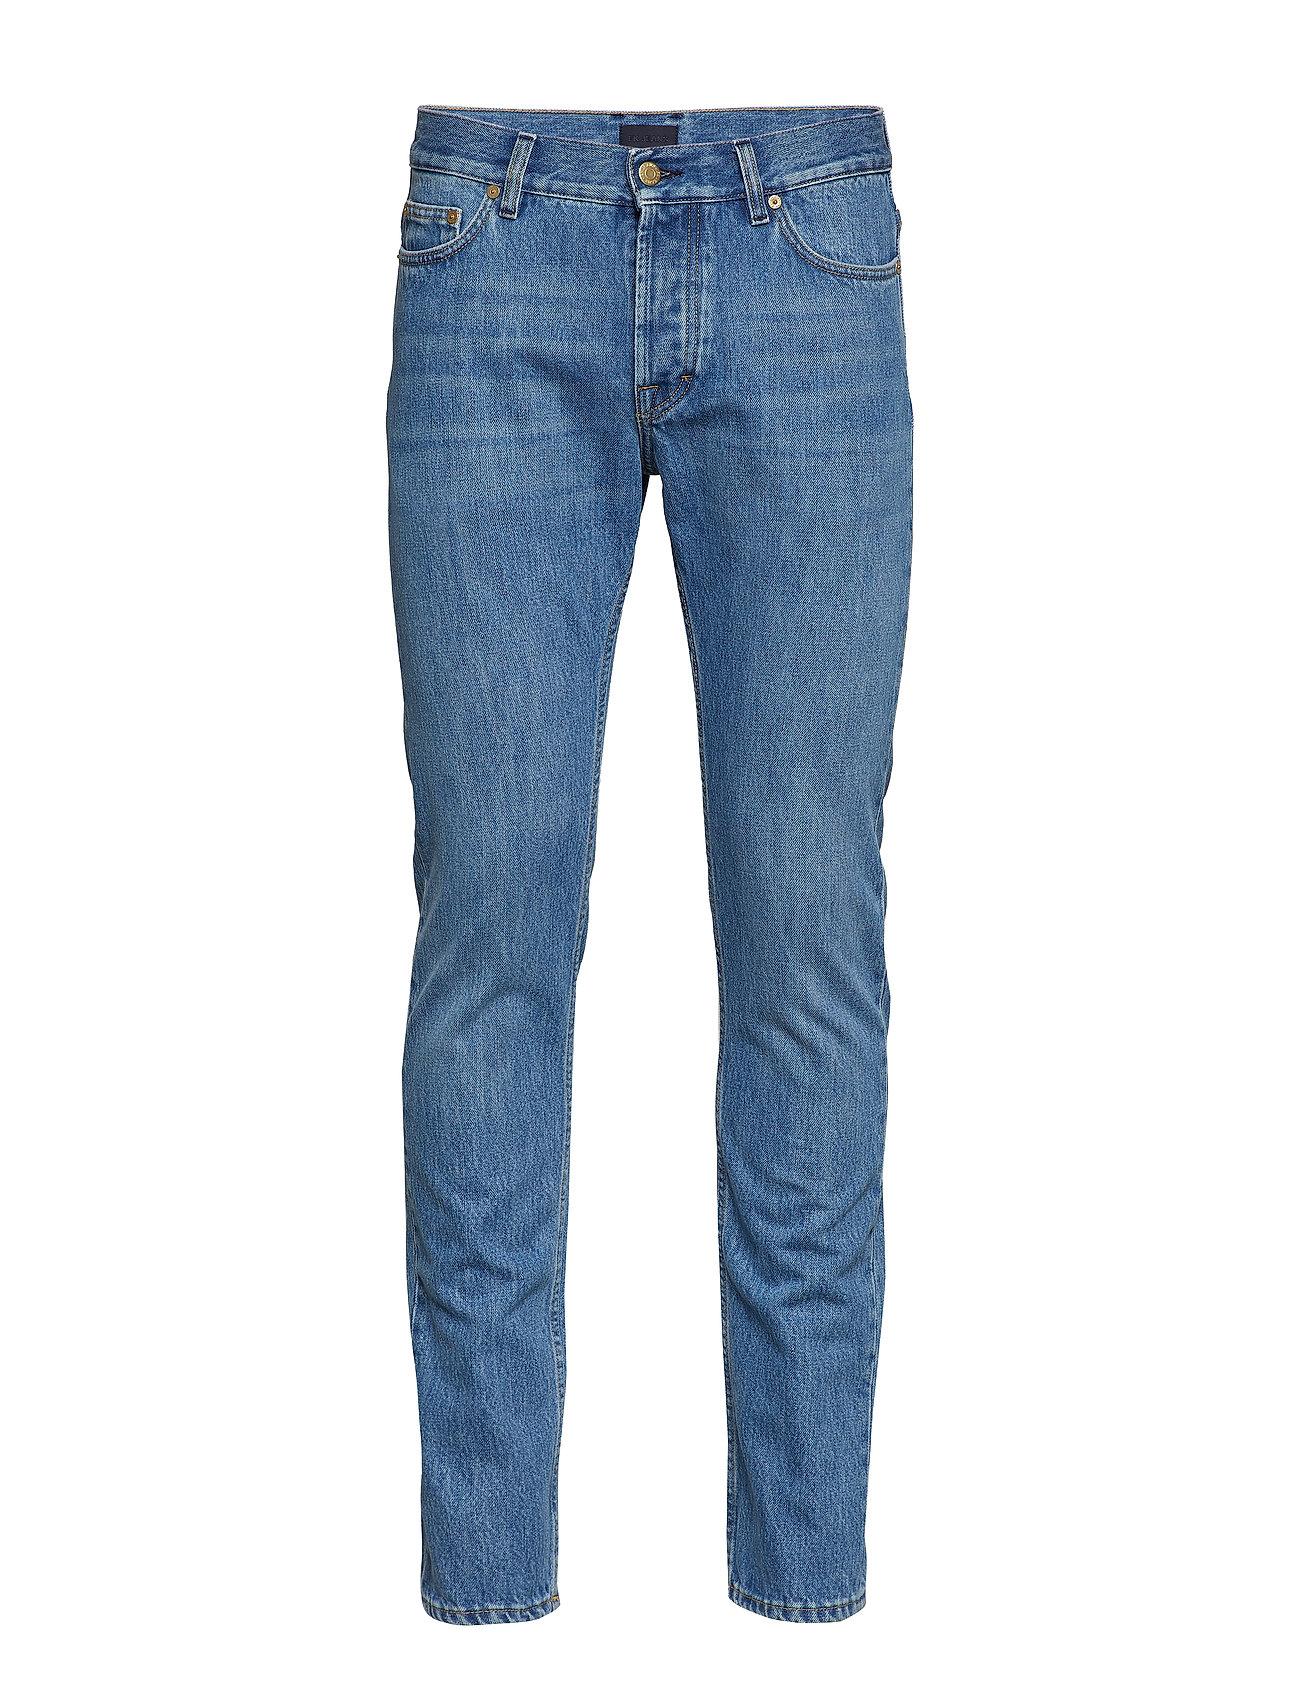 Filippa K M. Stan Stonewash Jeans - HEAVY STON